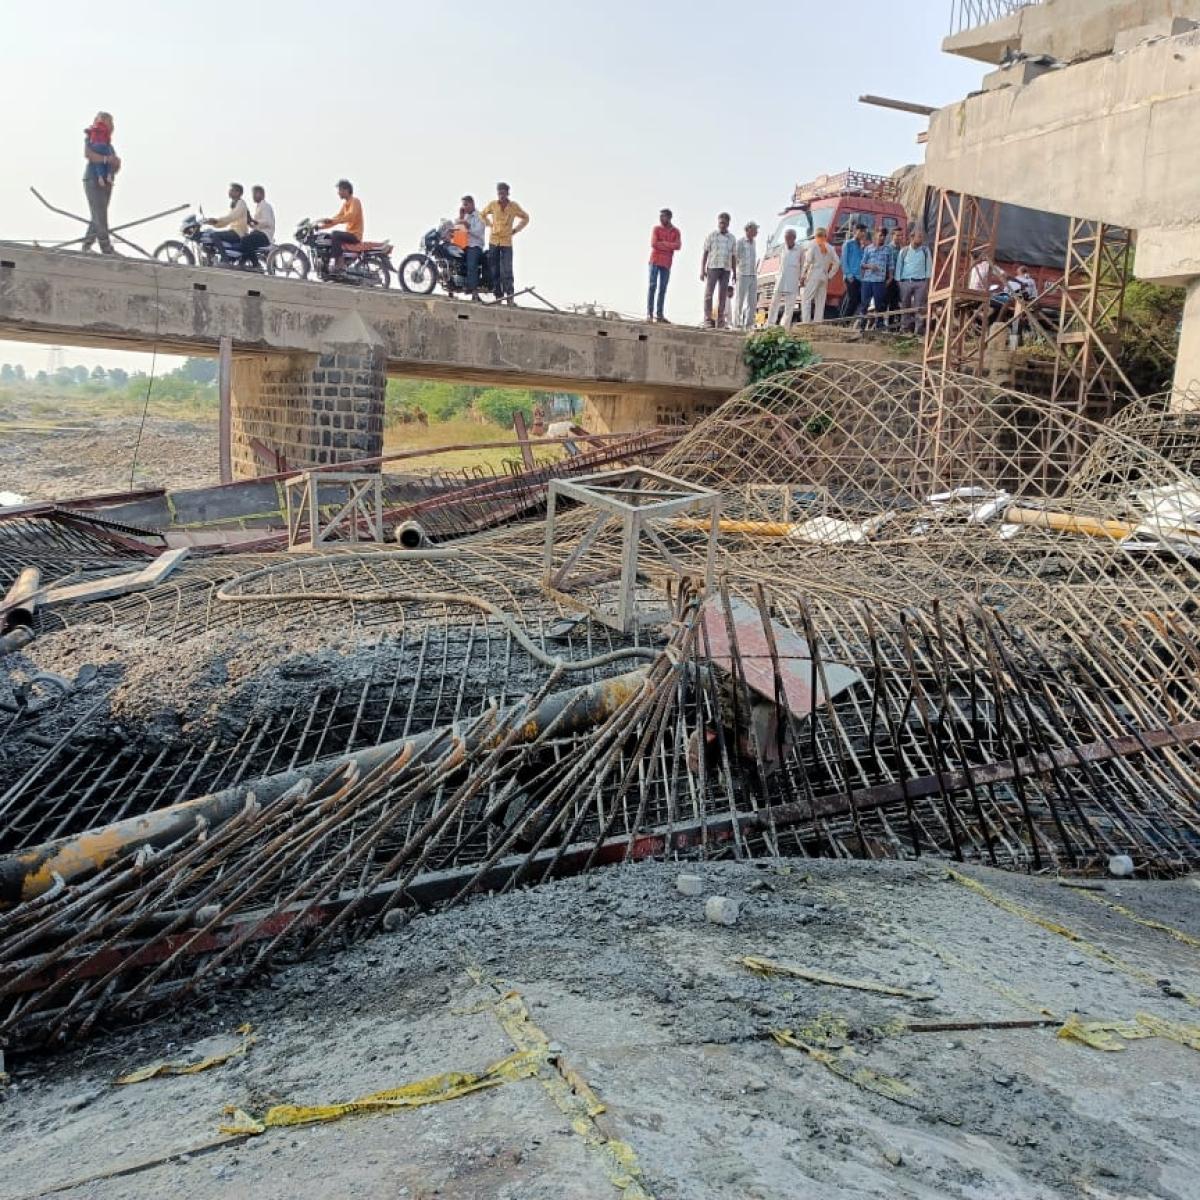 Ujjain: Labourer's body recovered from river bridge debris